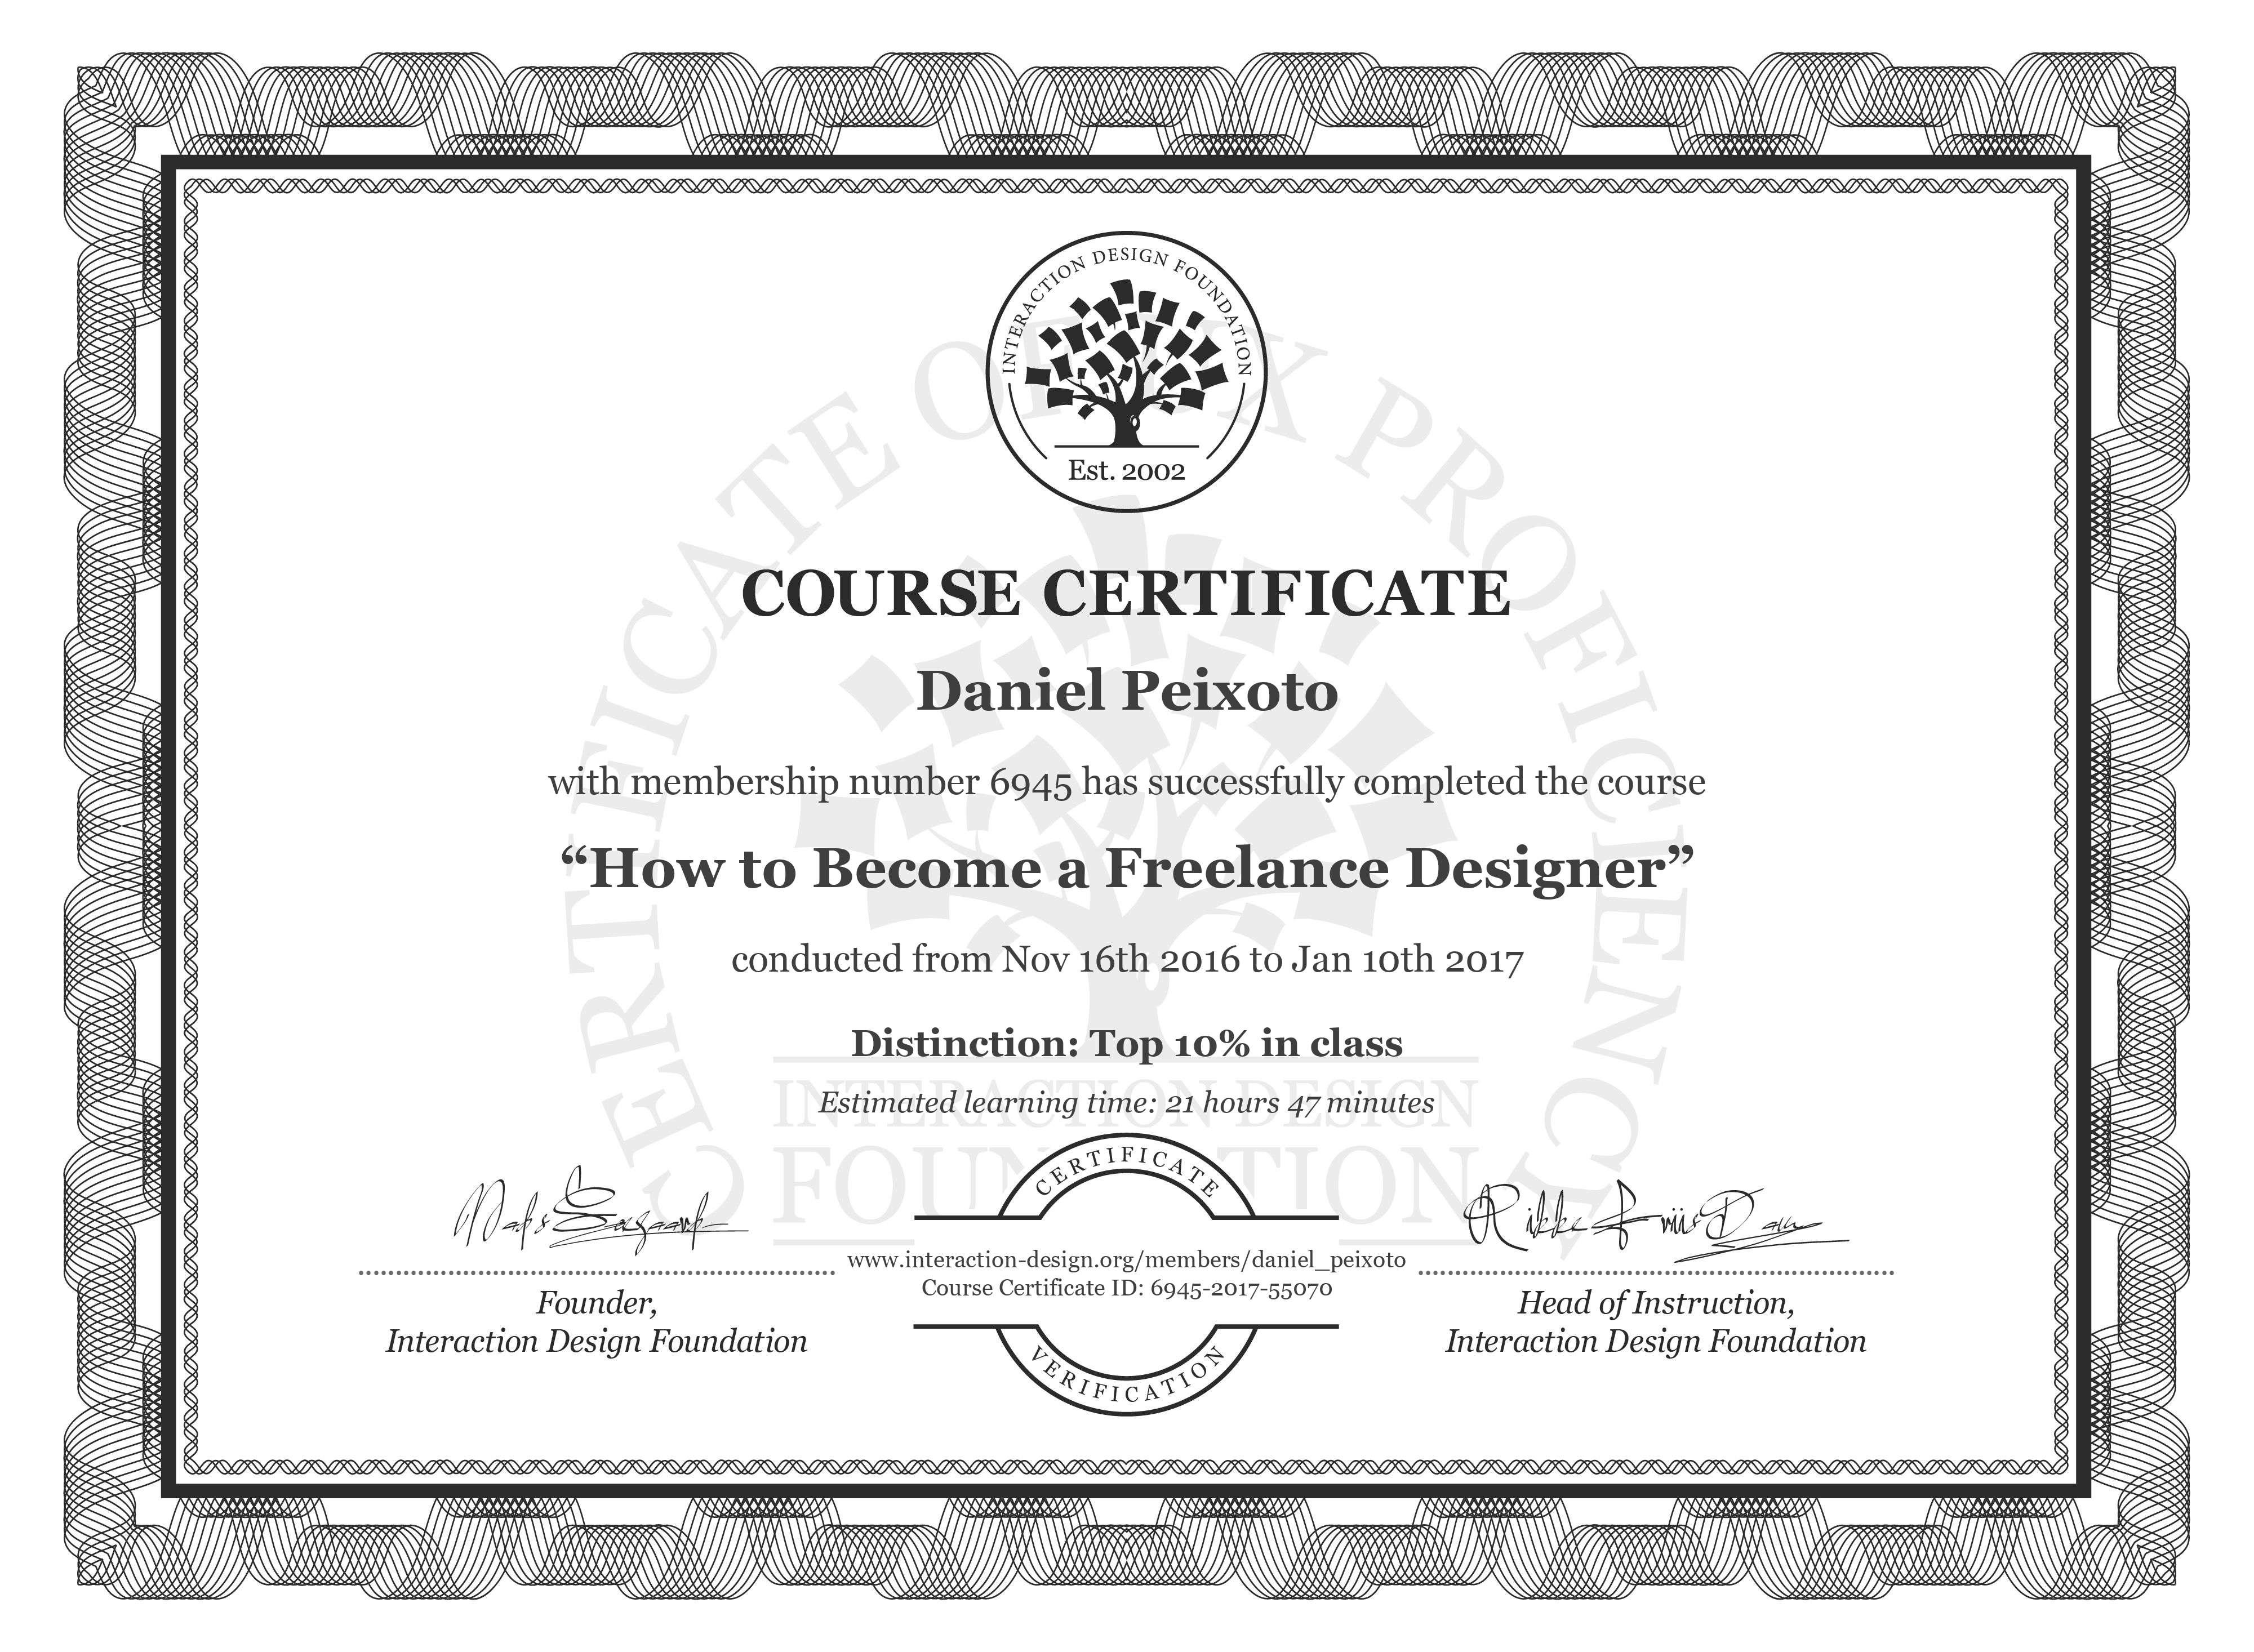 Daniel Peixoto: Course Certificate - How to Become a Freelance Designer